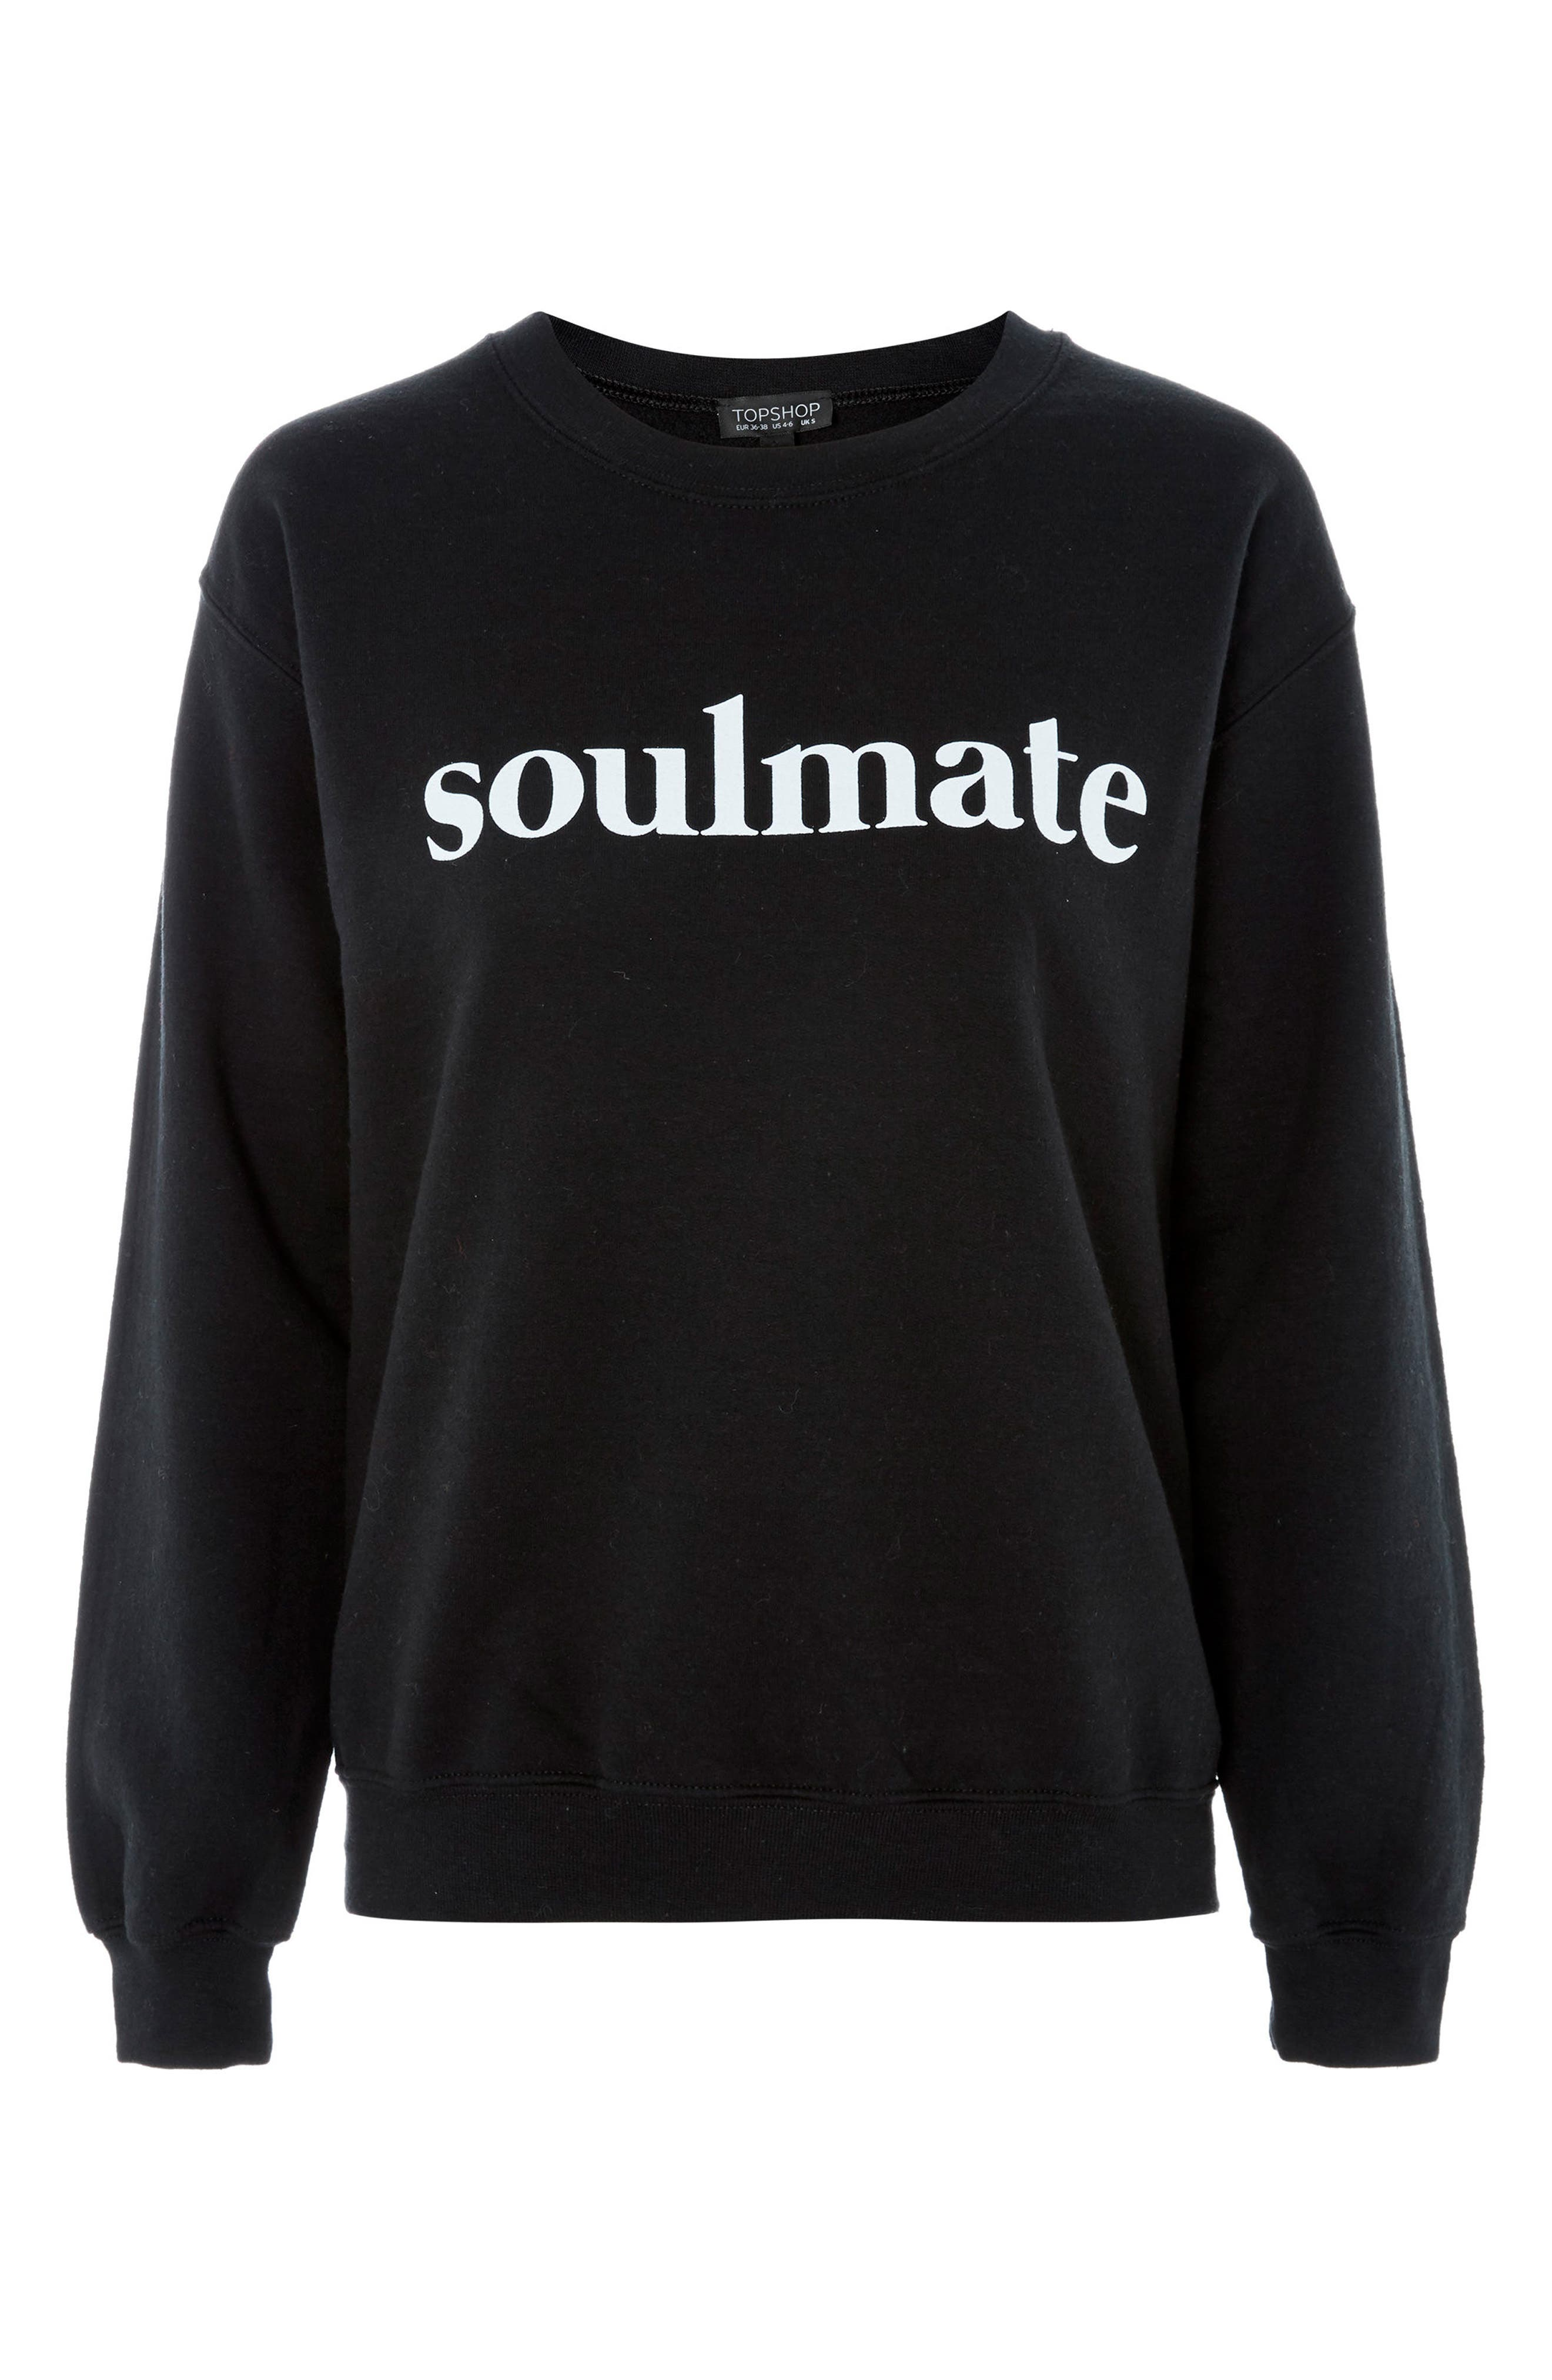 Soulmate Graphic Sweatshirt,                         Main,                         color, Black Multi